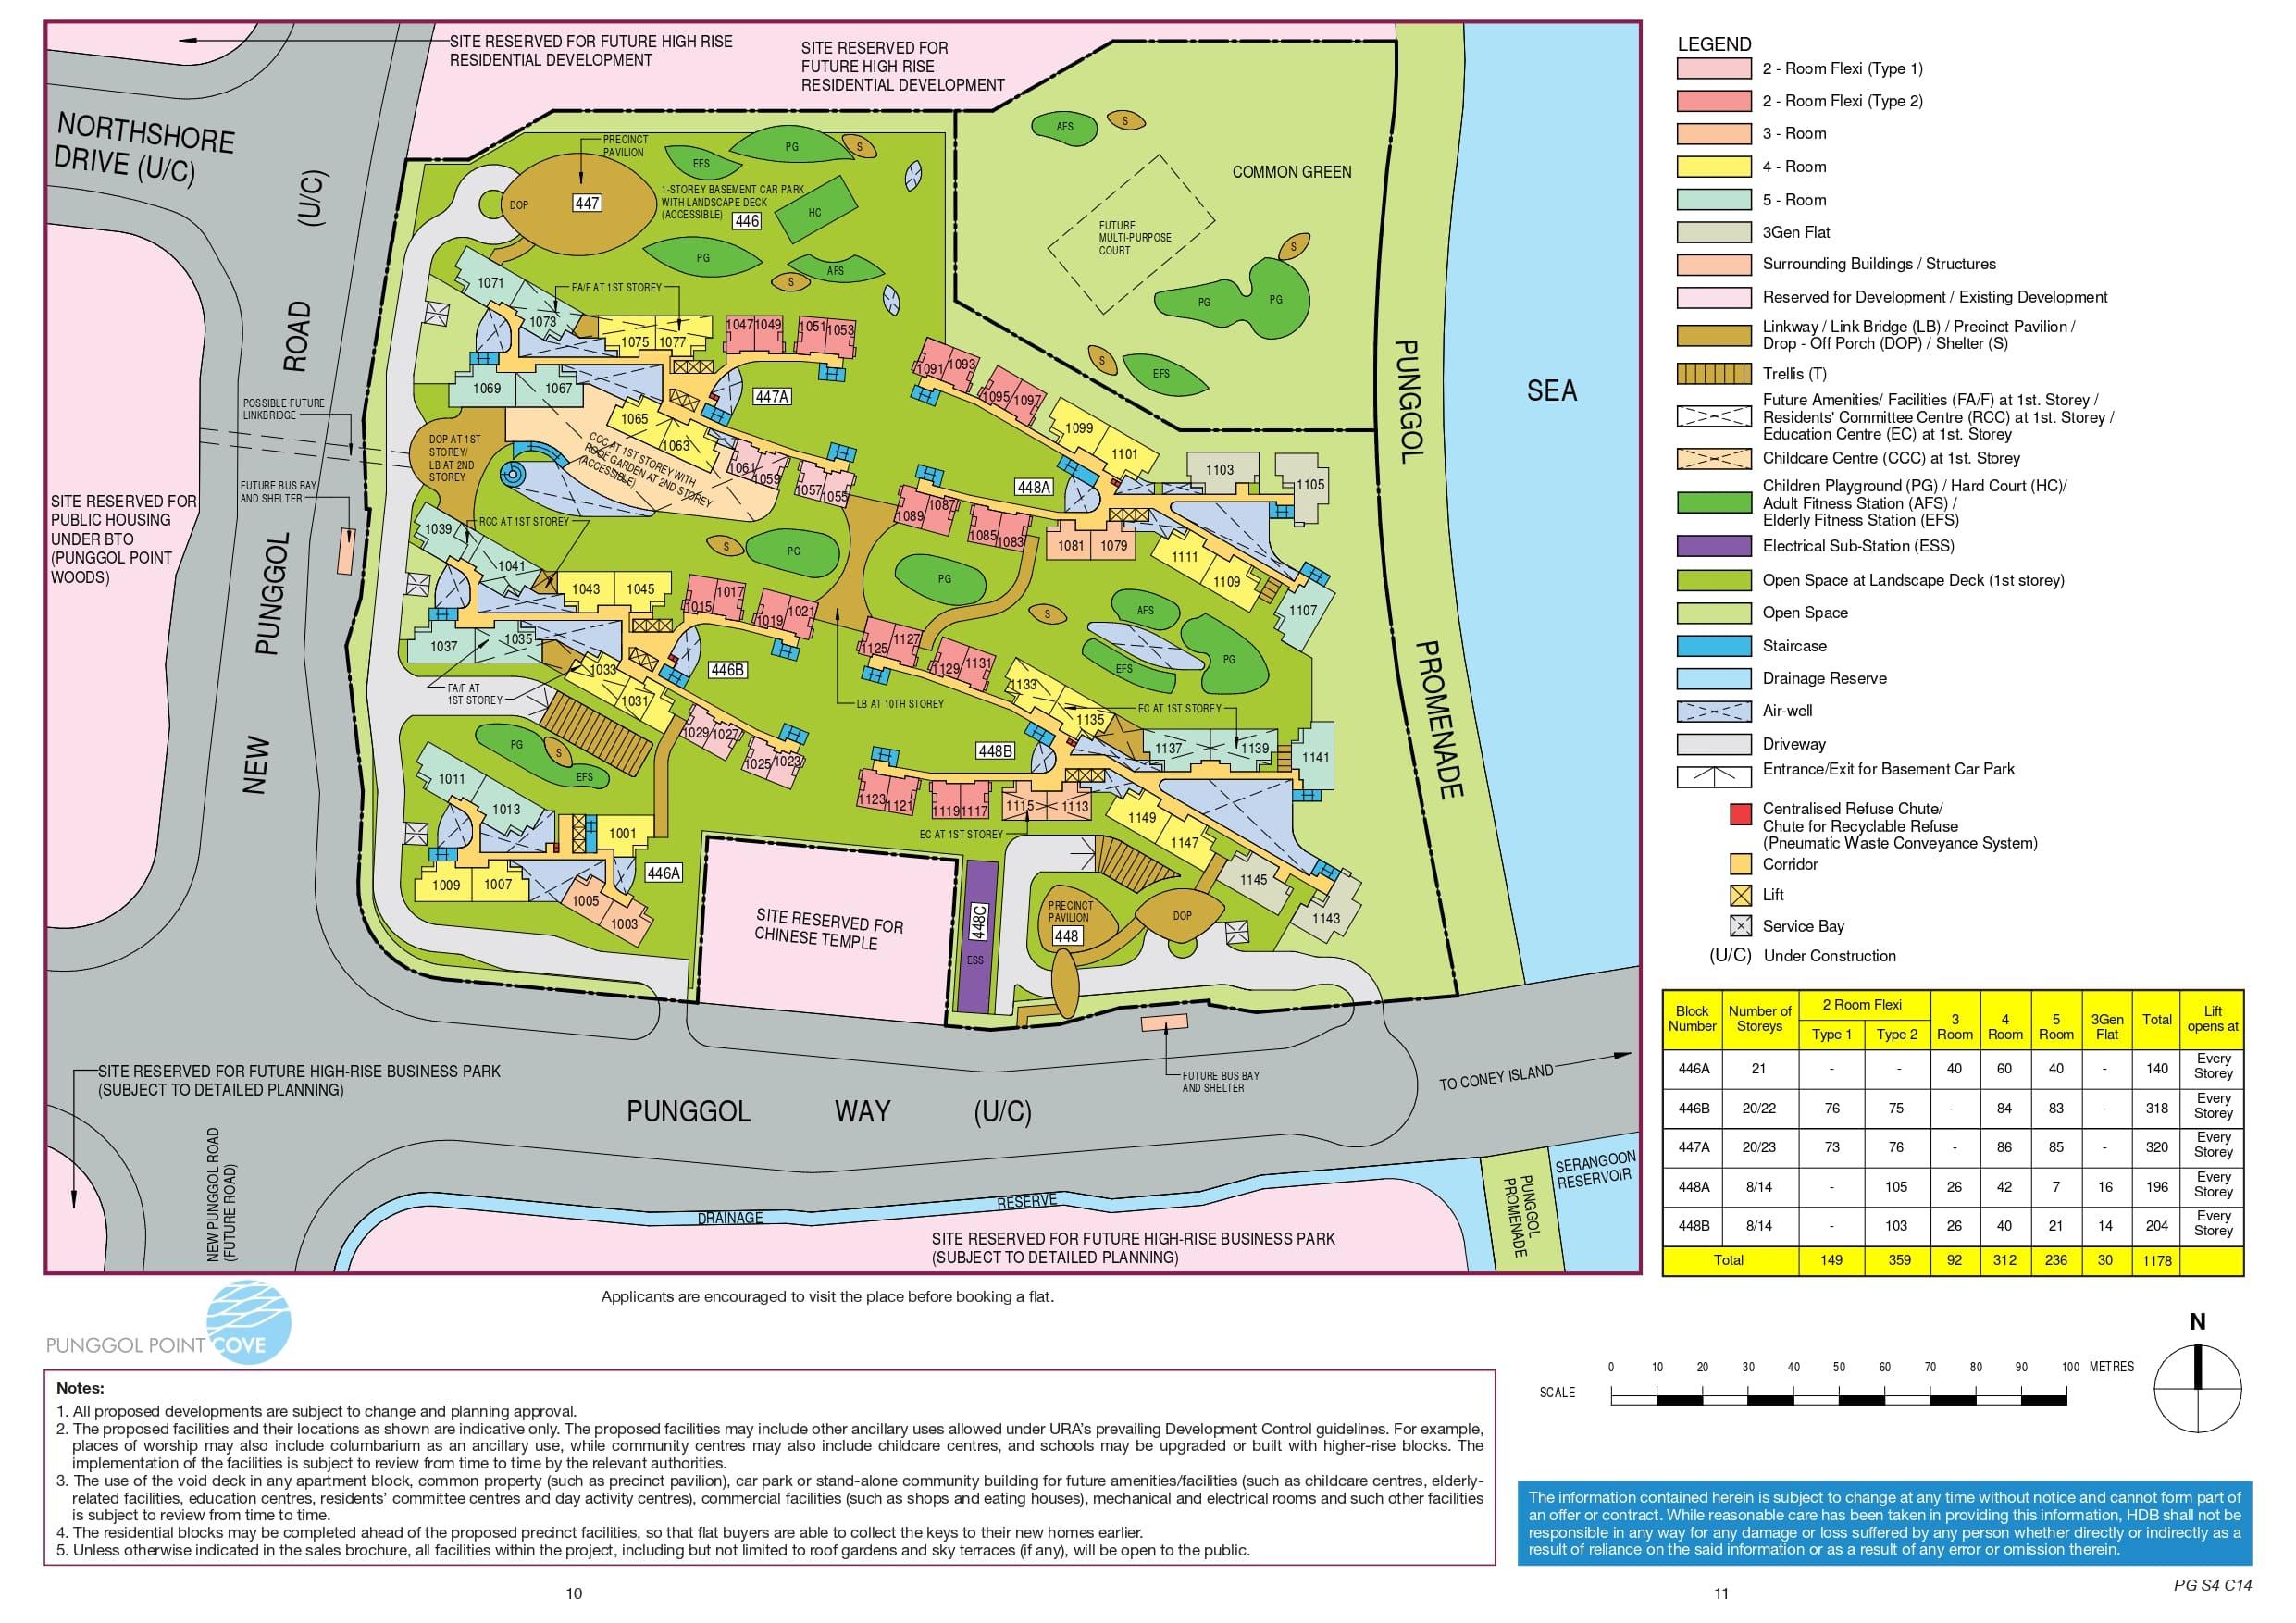 Punggol Point Cove Site Plan